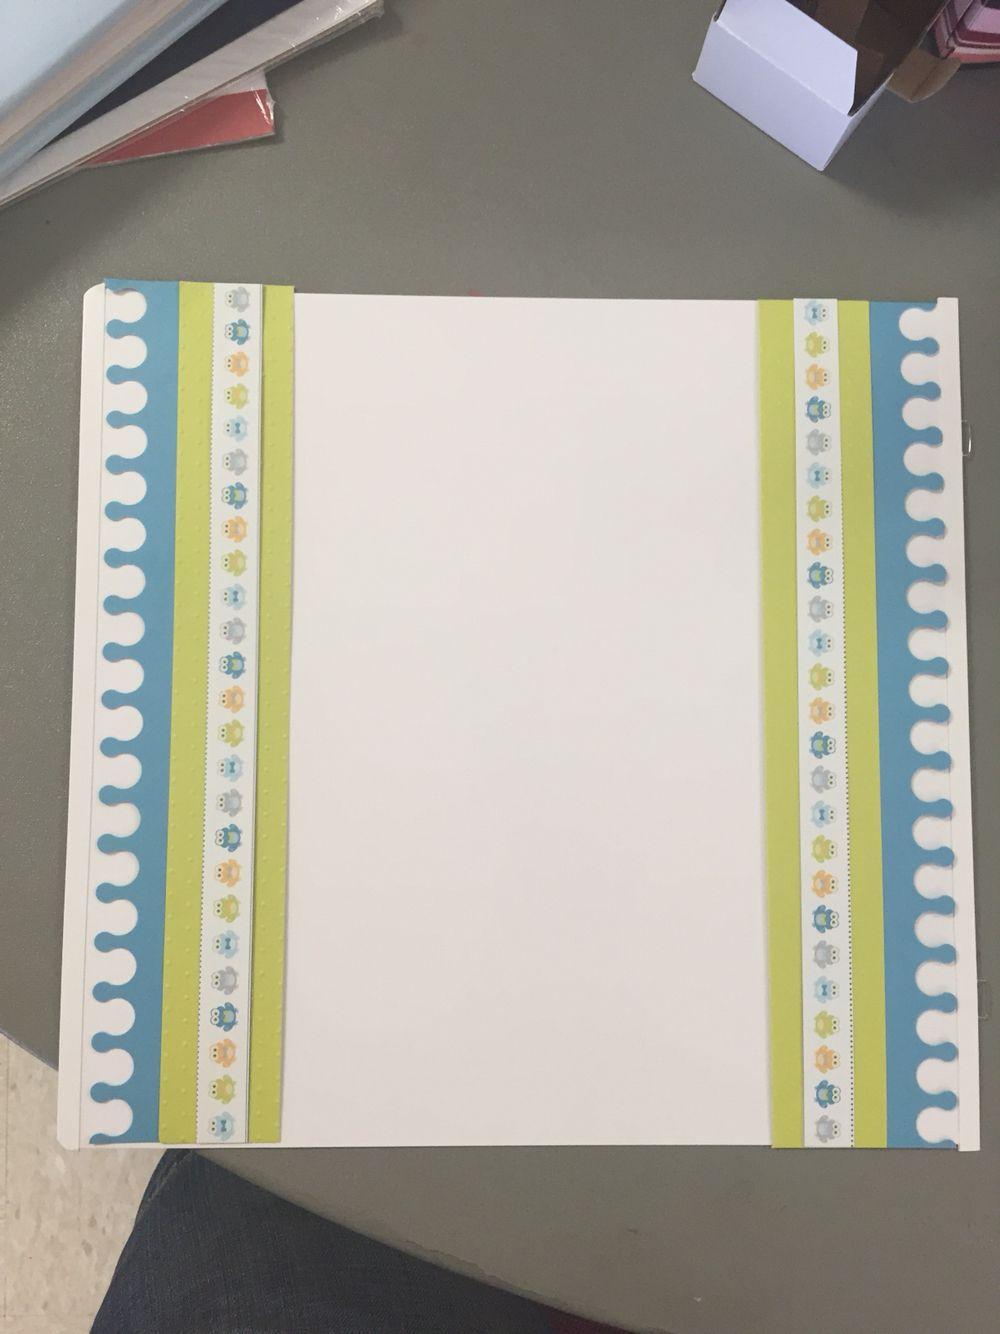 Scrapbook border ideas - Scrapbook Border I Made Using The Creative Memories Crown Border Cartridge